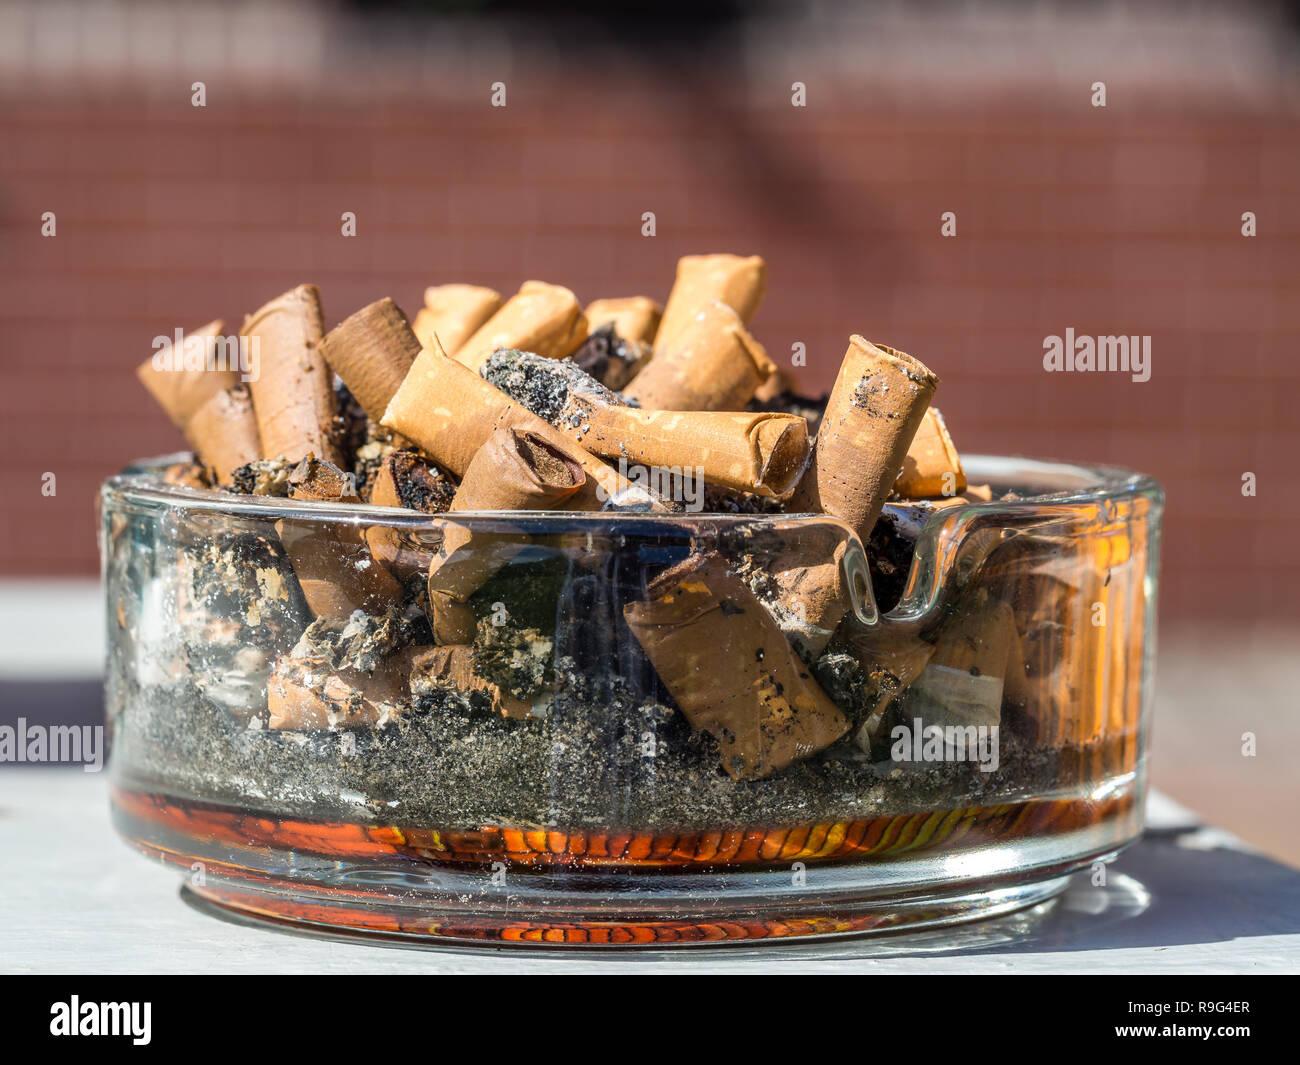 Ashtray symbolic picture - Stock Image